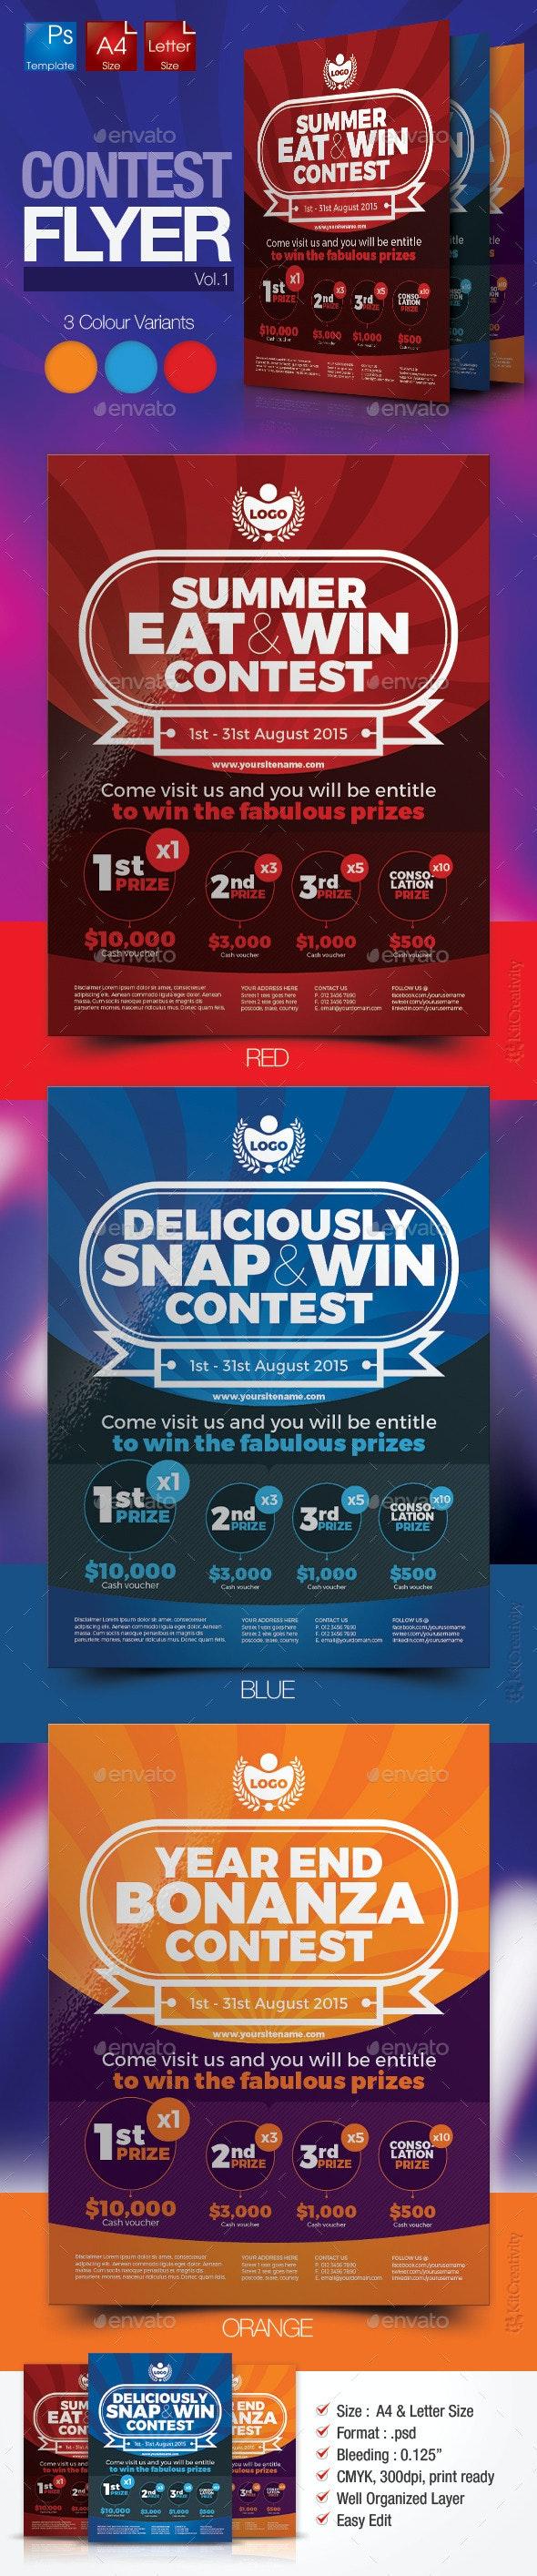 Simple Contest Flyer Vol.1 - Miscellaneous Events